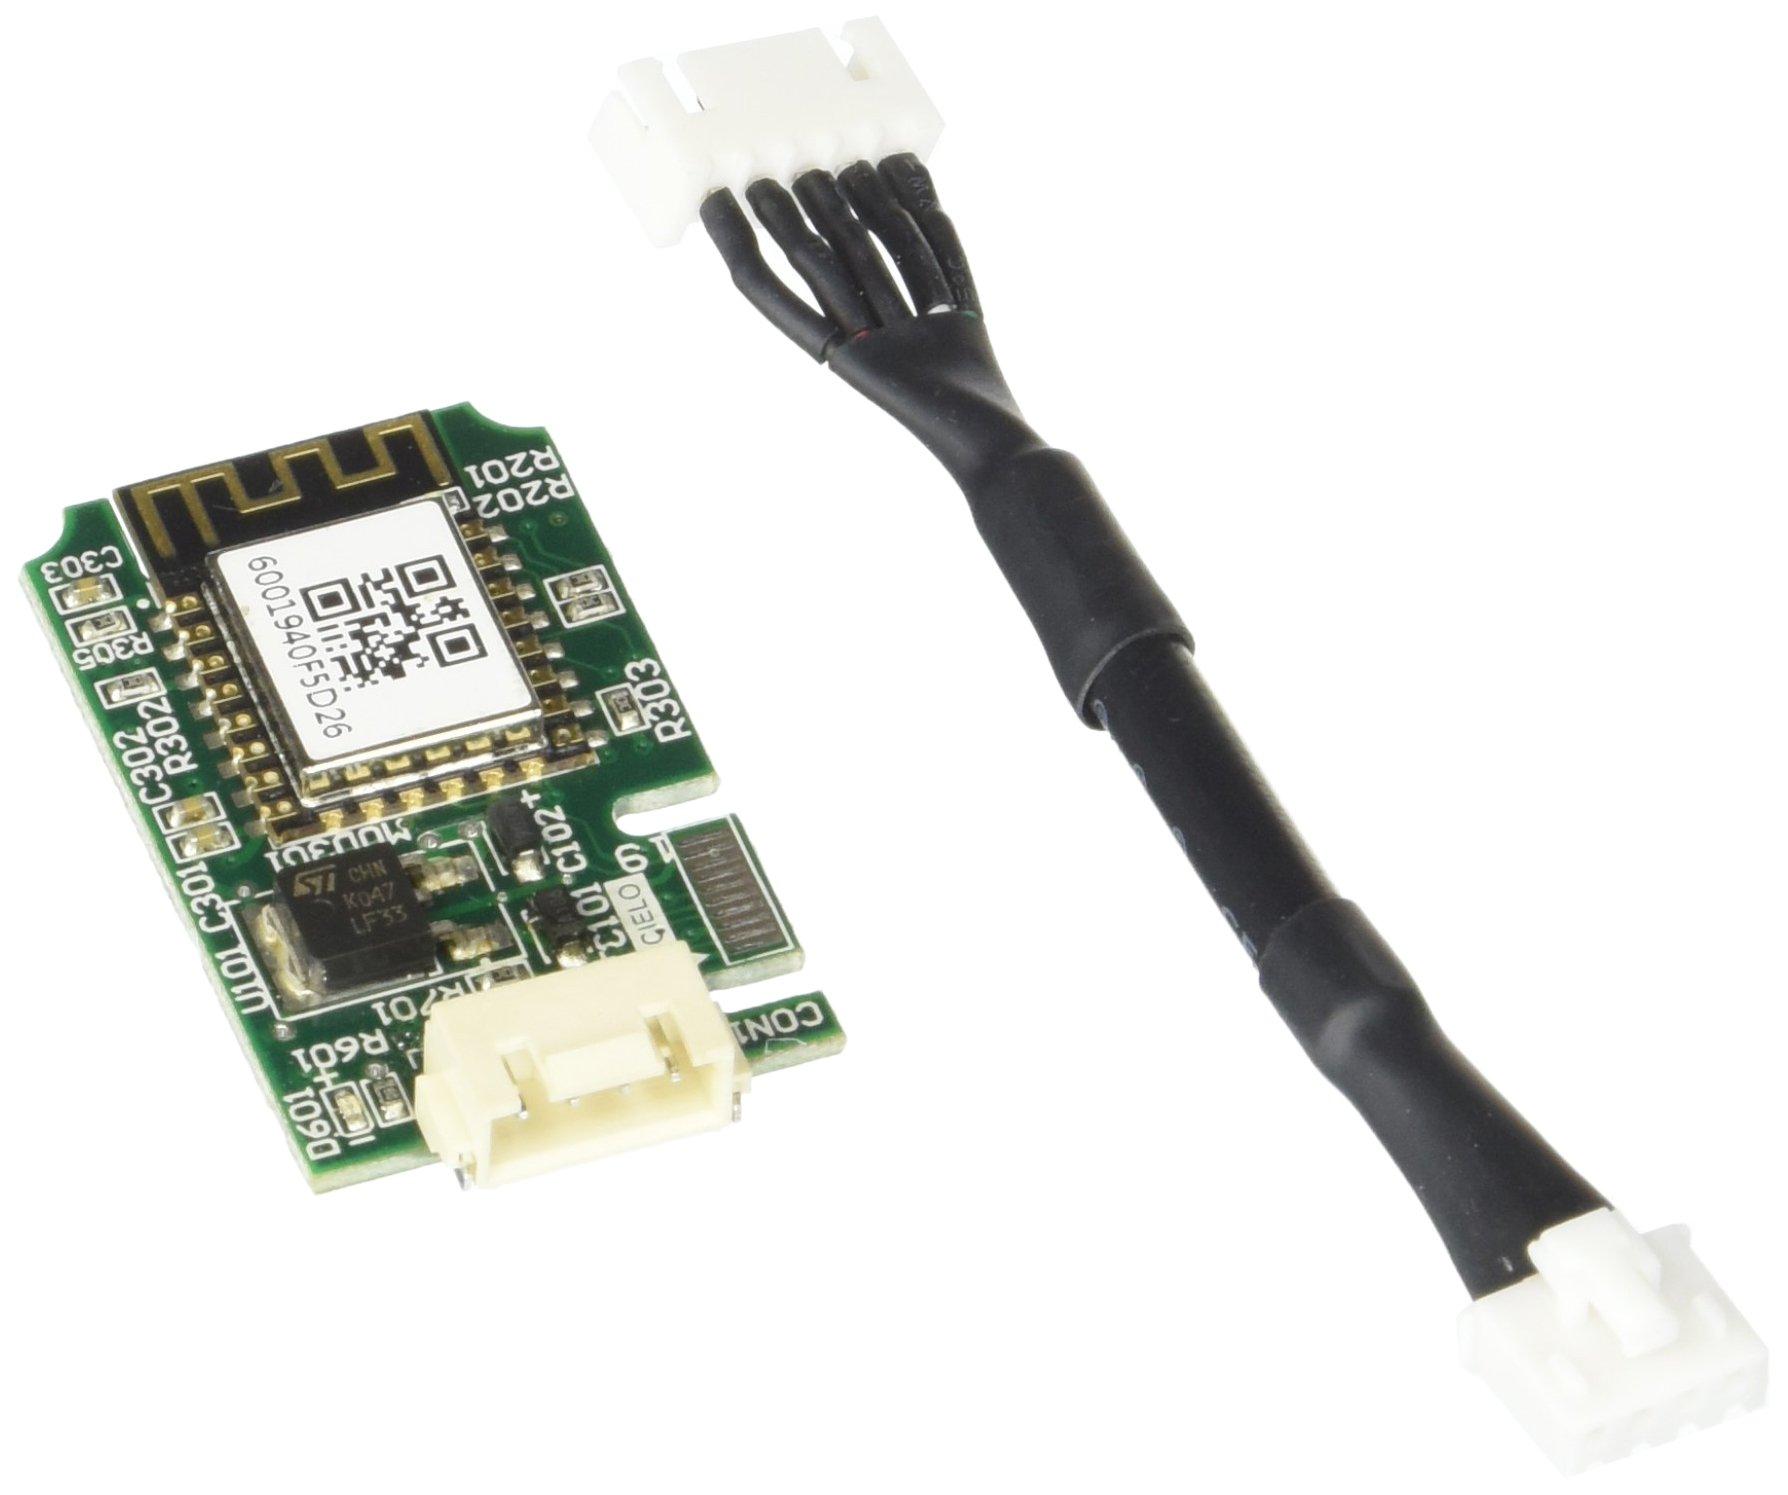 PIONEER Air Conditioner Wireless Internet Worldwide Access, Program, Control Module